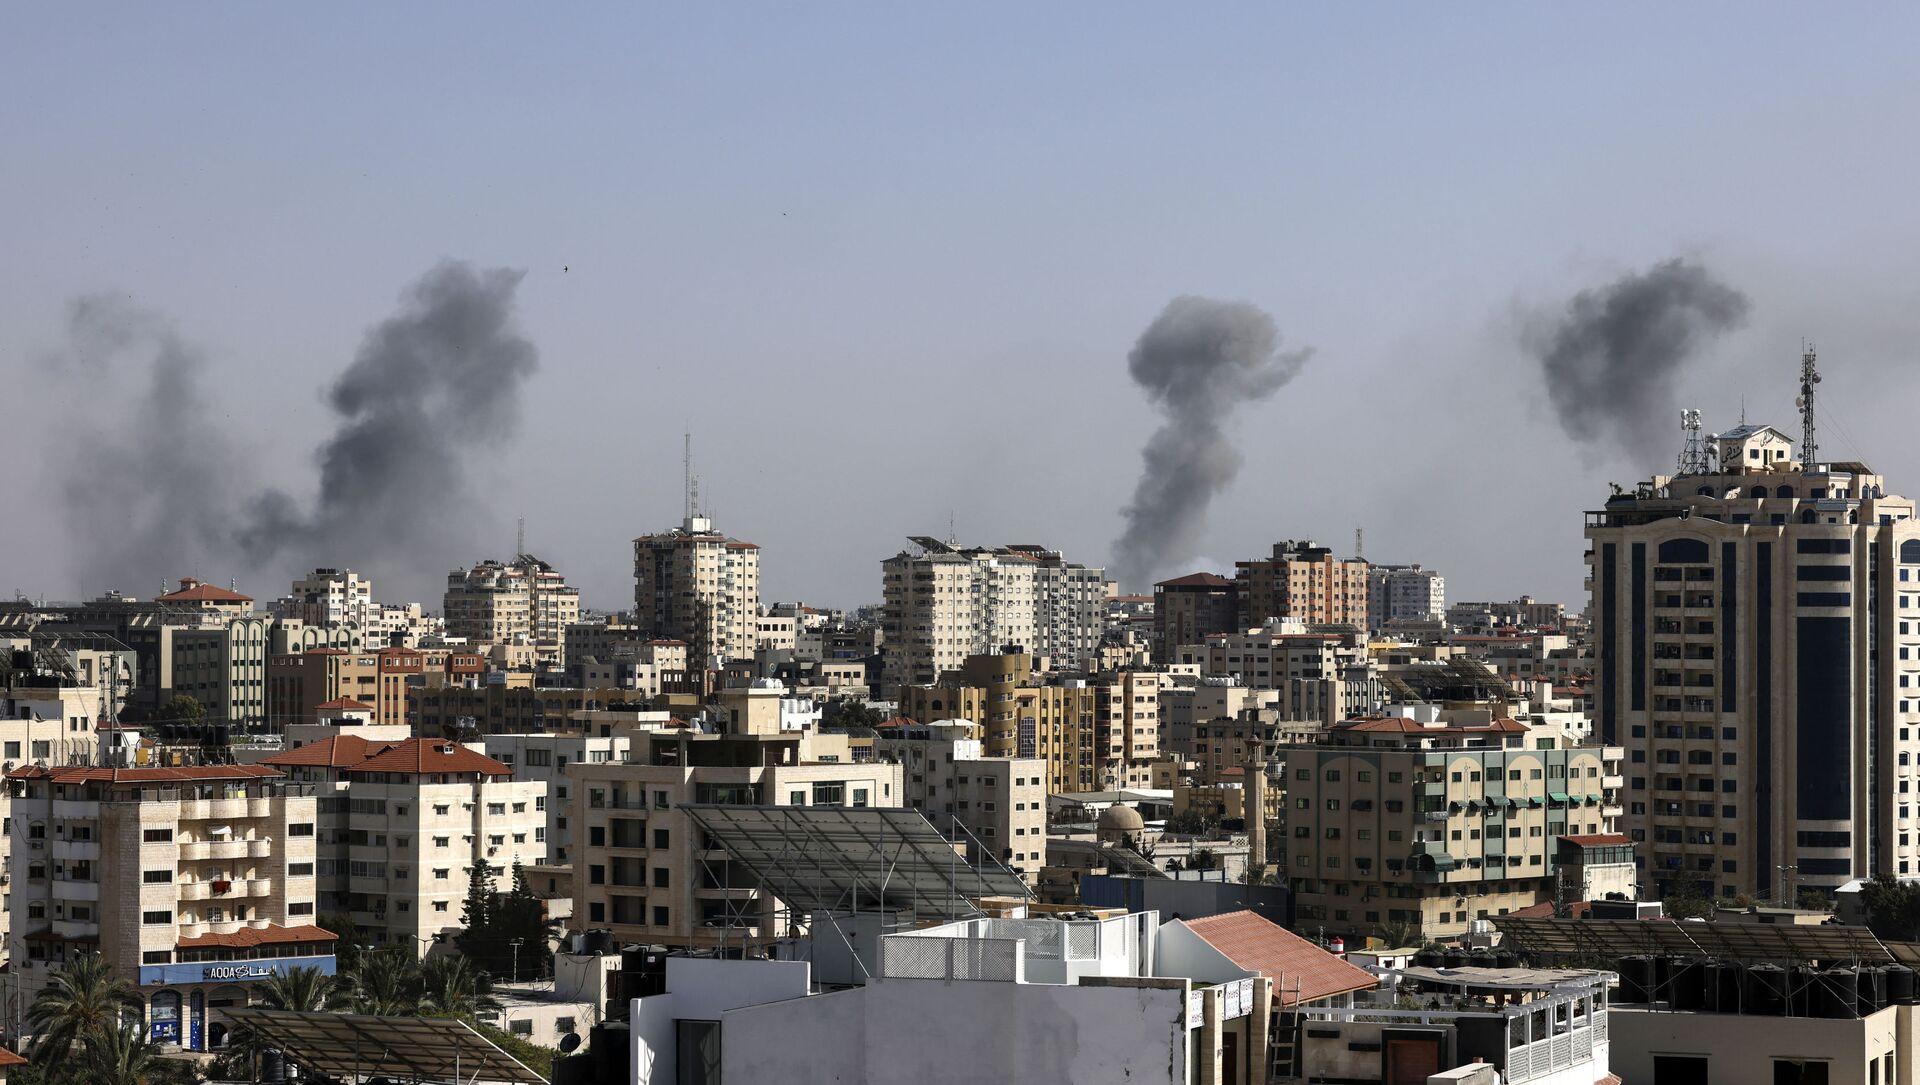 Israël bombarde la bande de Gaza - Sputnik France, 1920, 27.07.2021